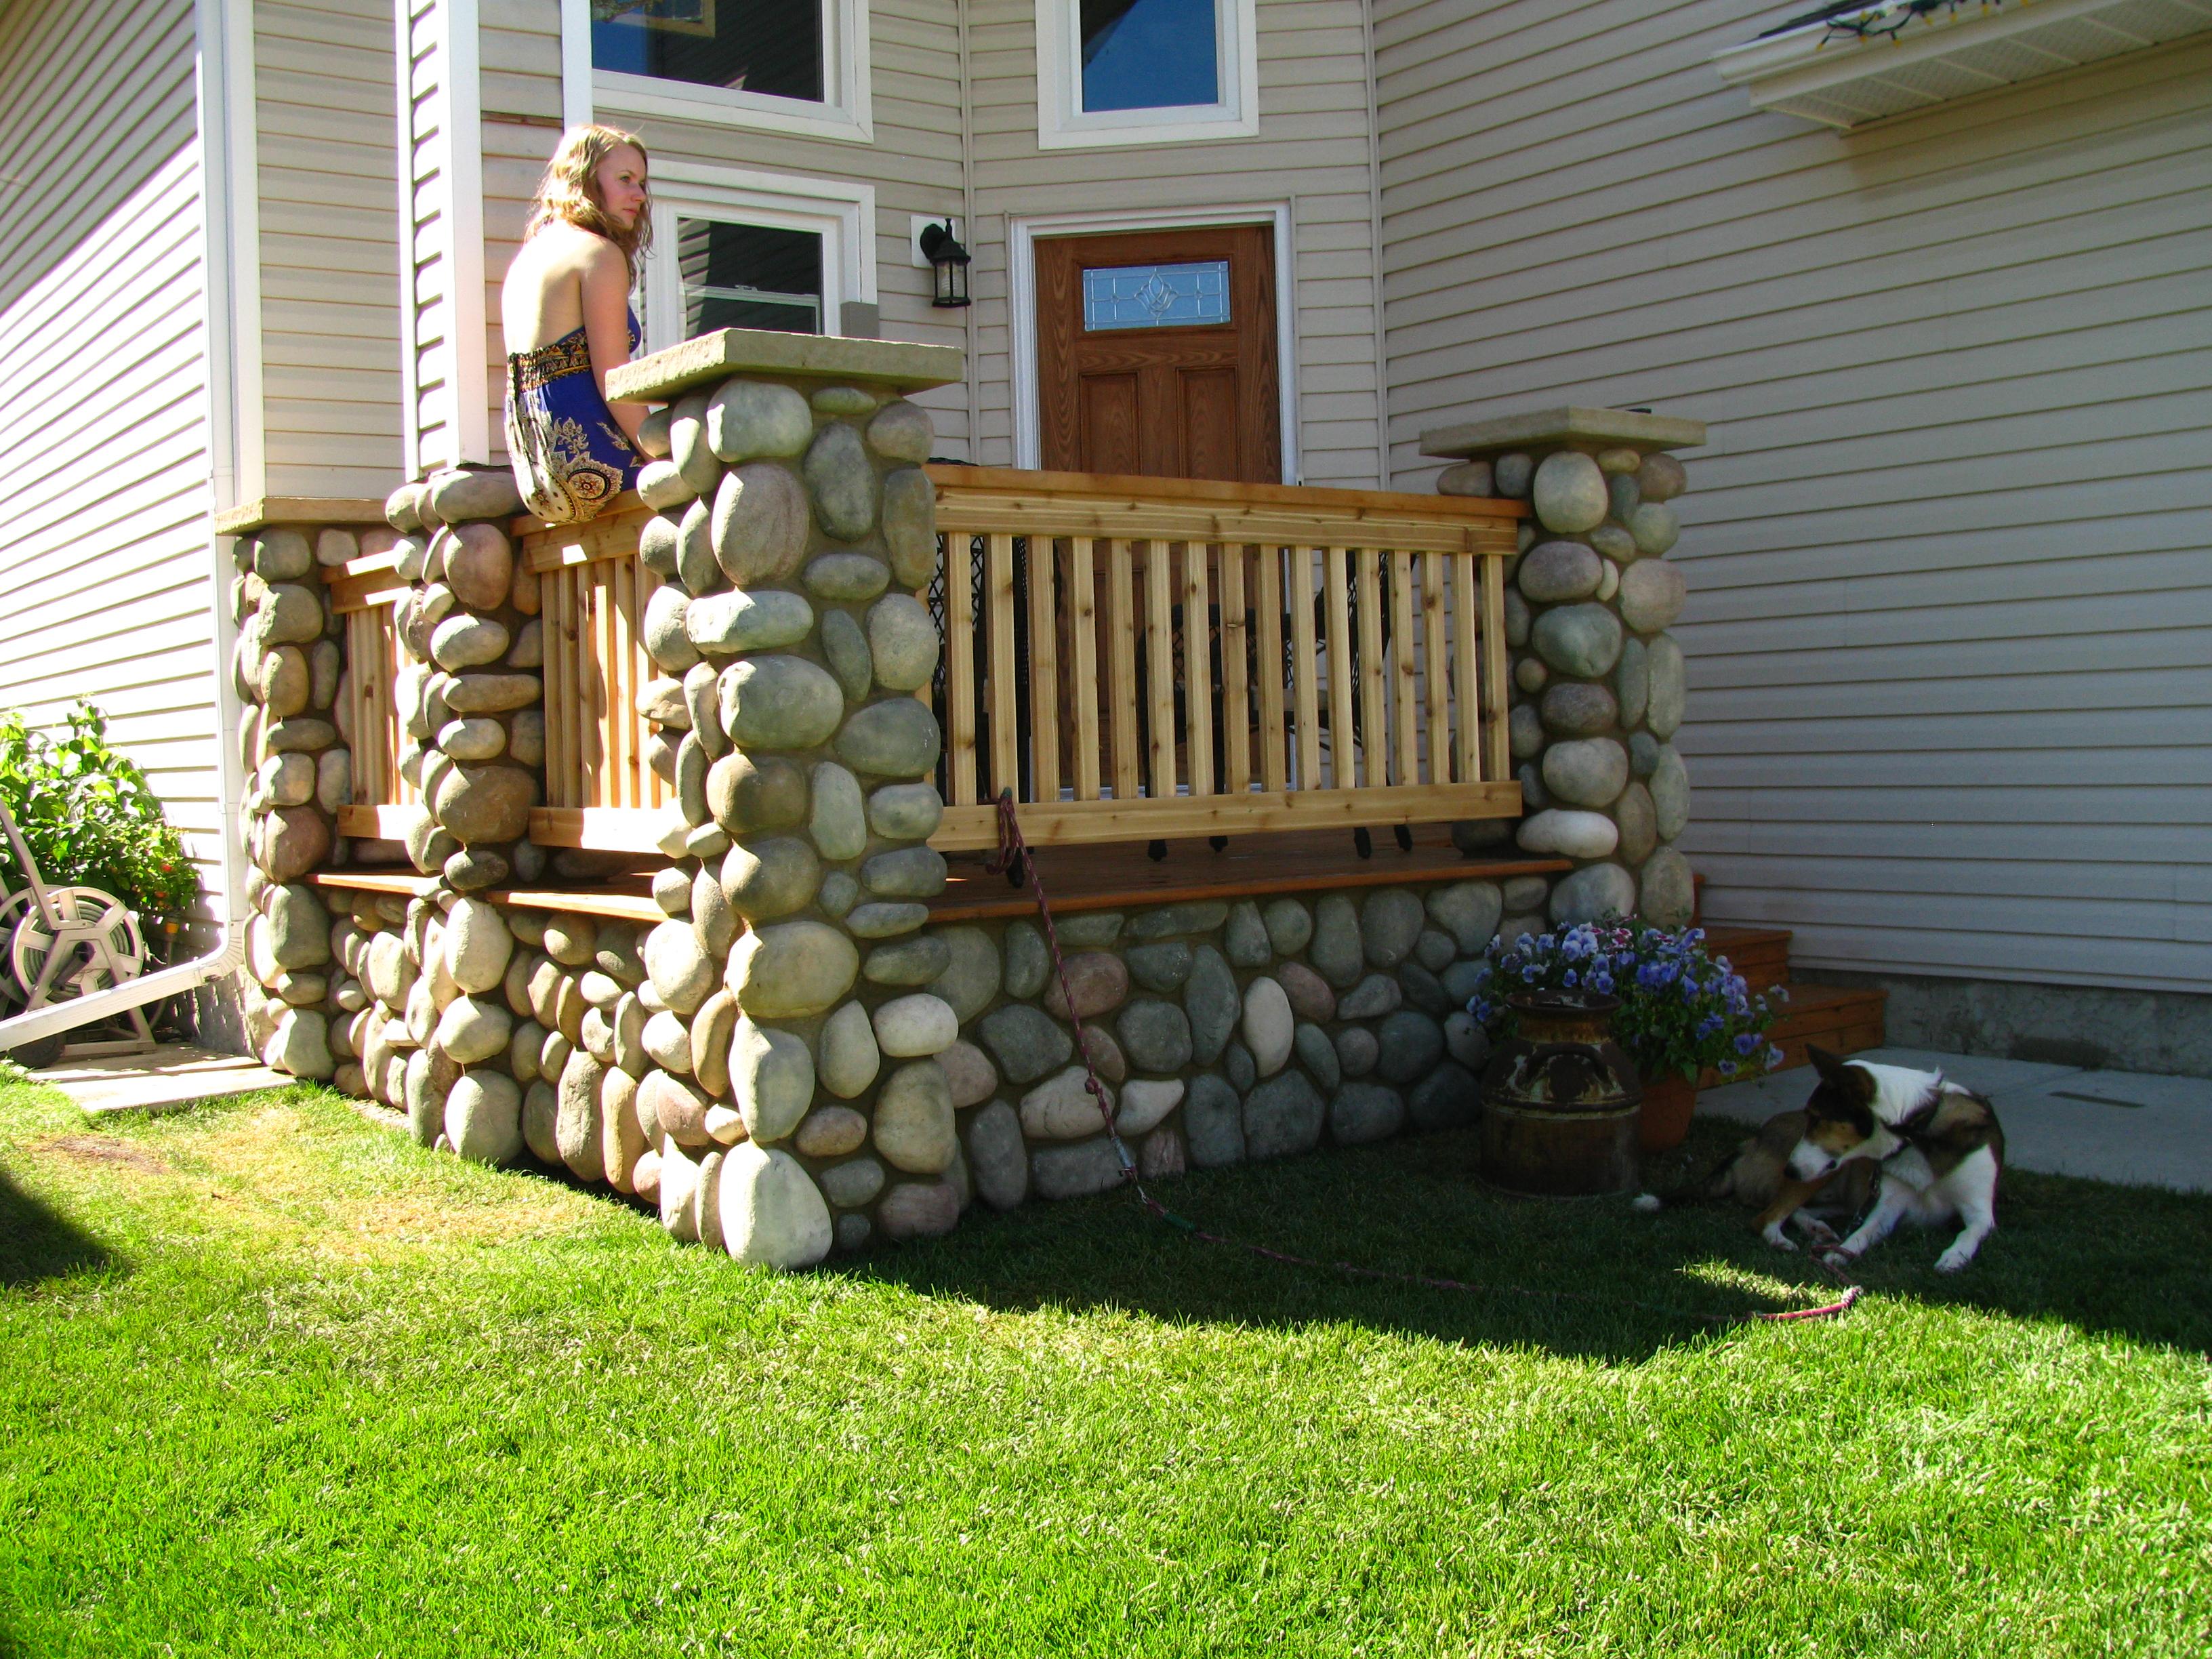 Cedar deck and stone